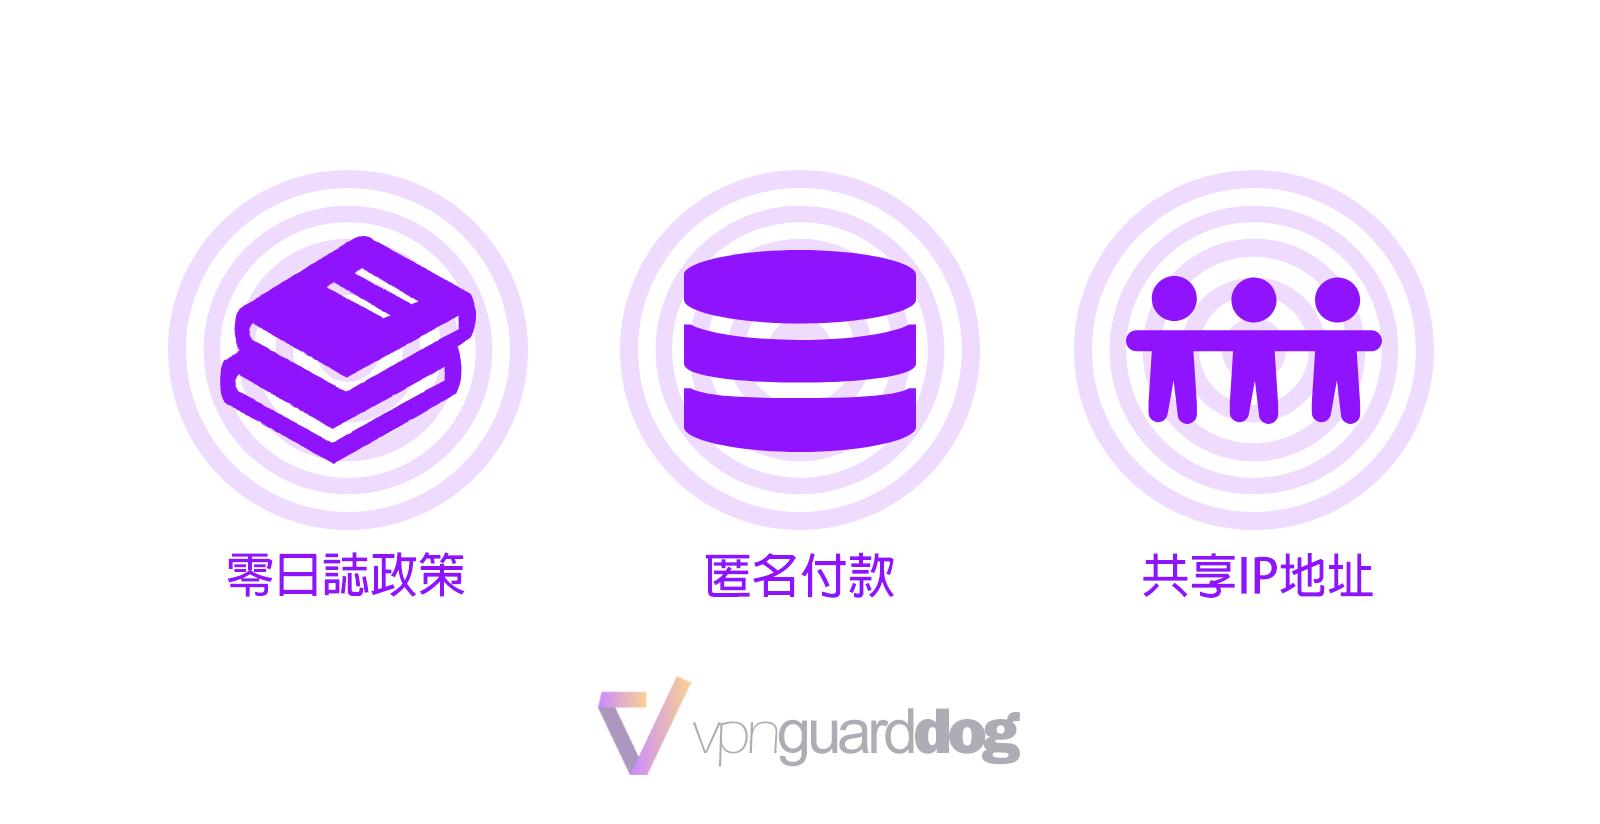 VPN服務商為關心私穩的用戶所訂立的基本政策